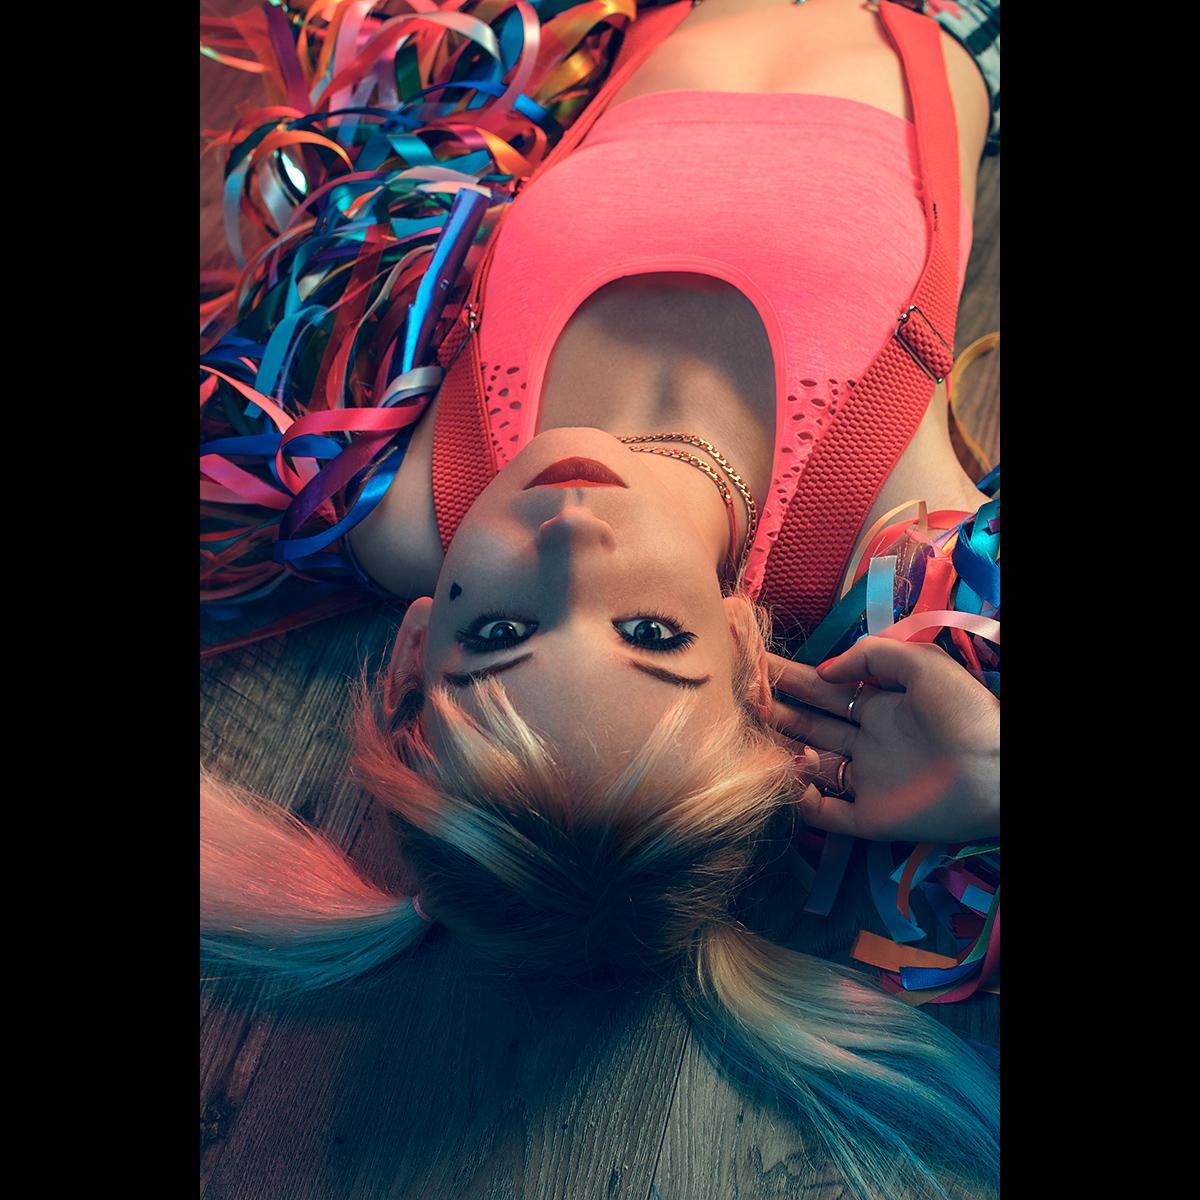 Łukasz Liszko - fotografia cosplay - Natalia Nowicka - Harley Quinn Birds of Prey